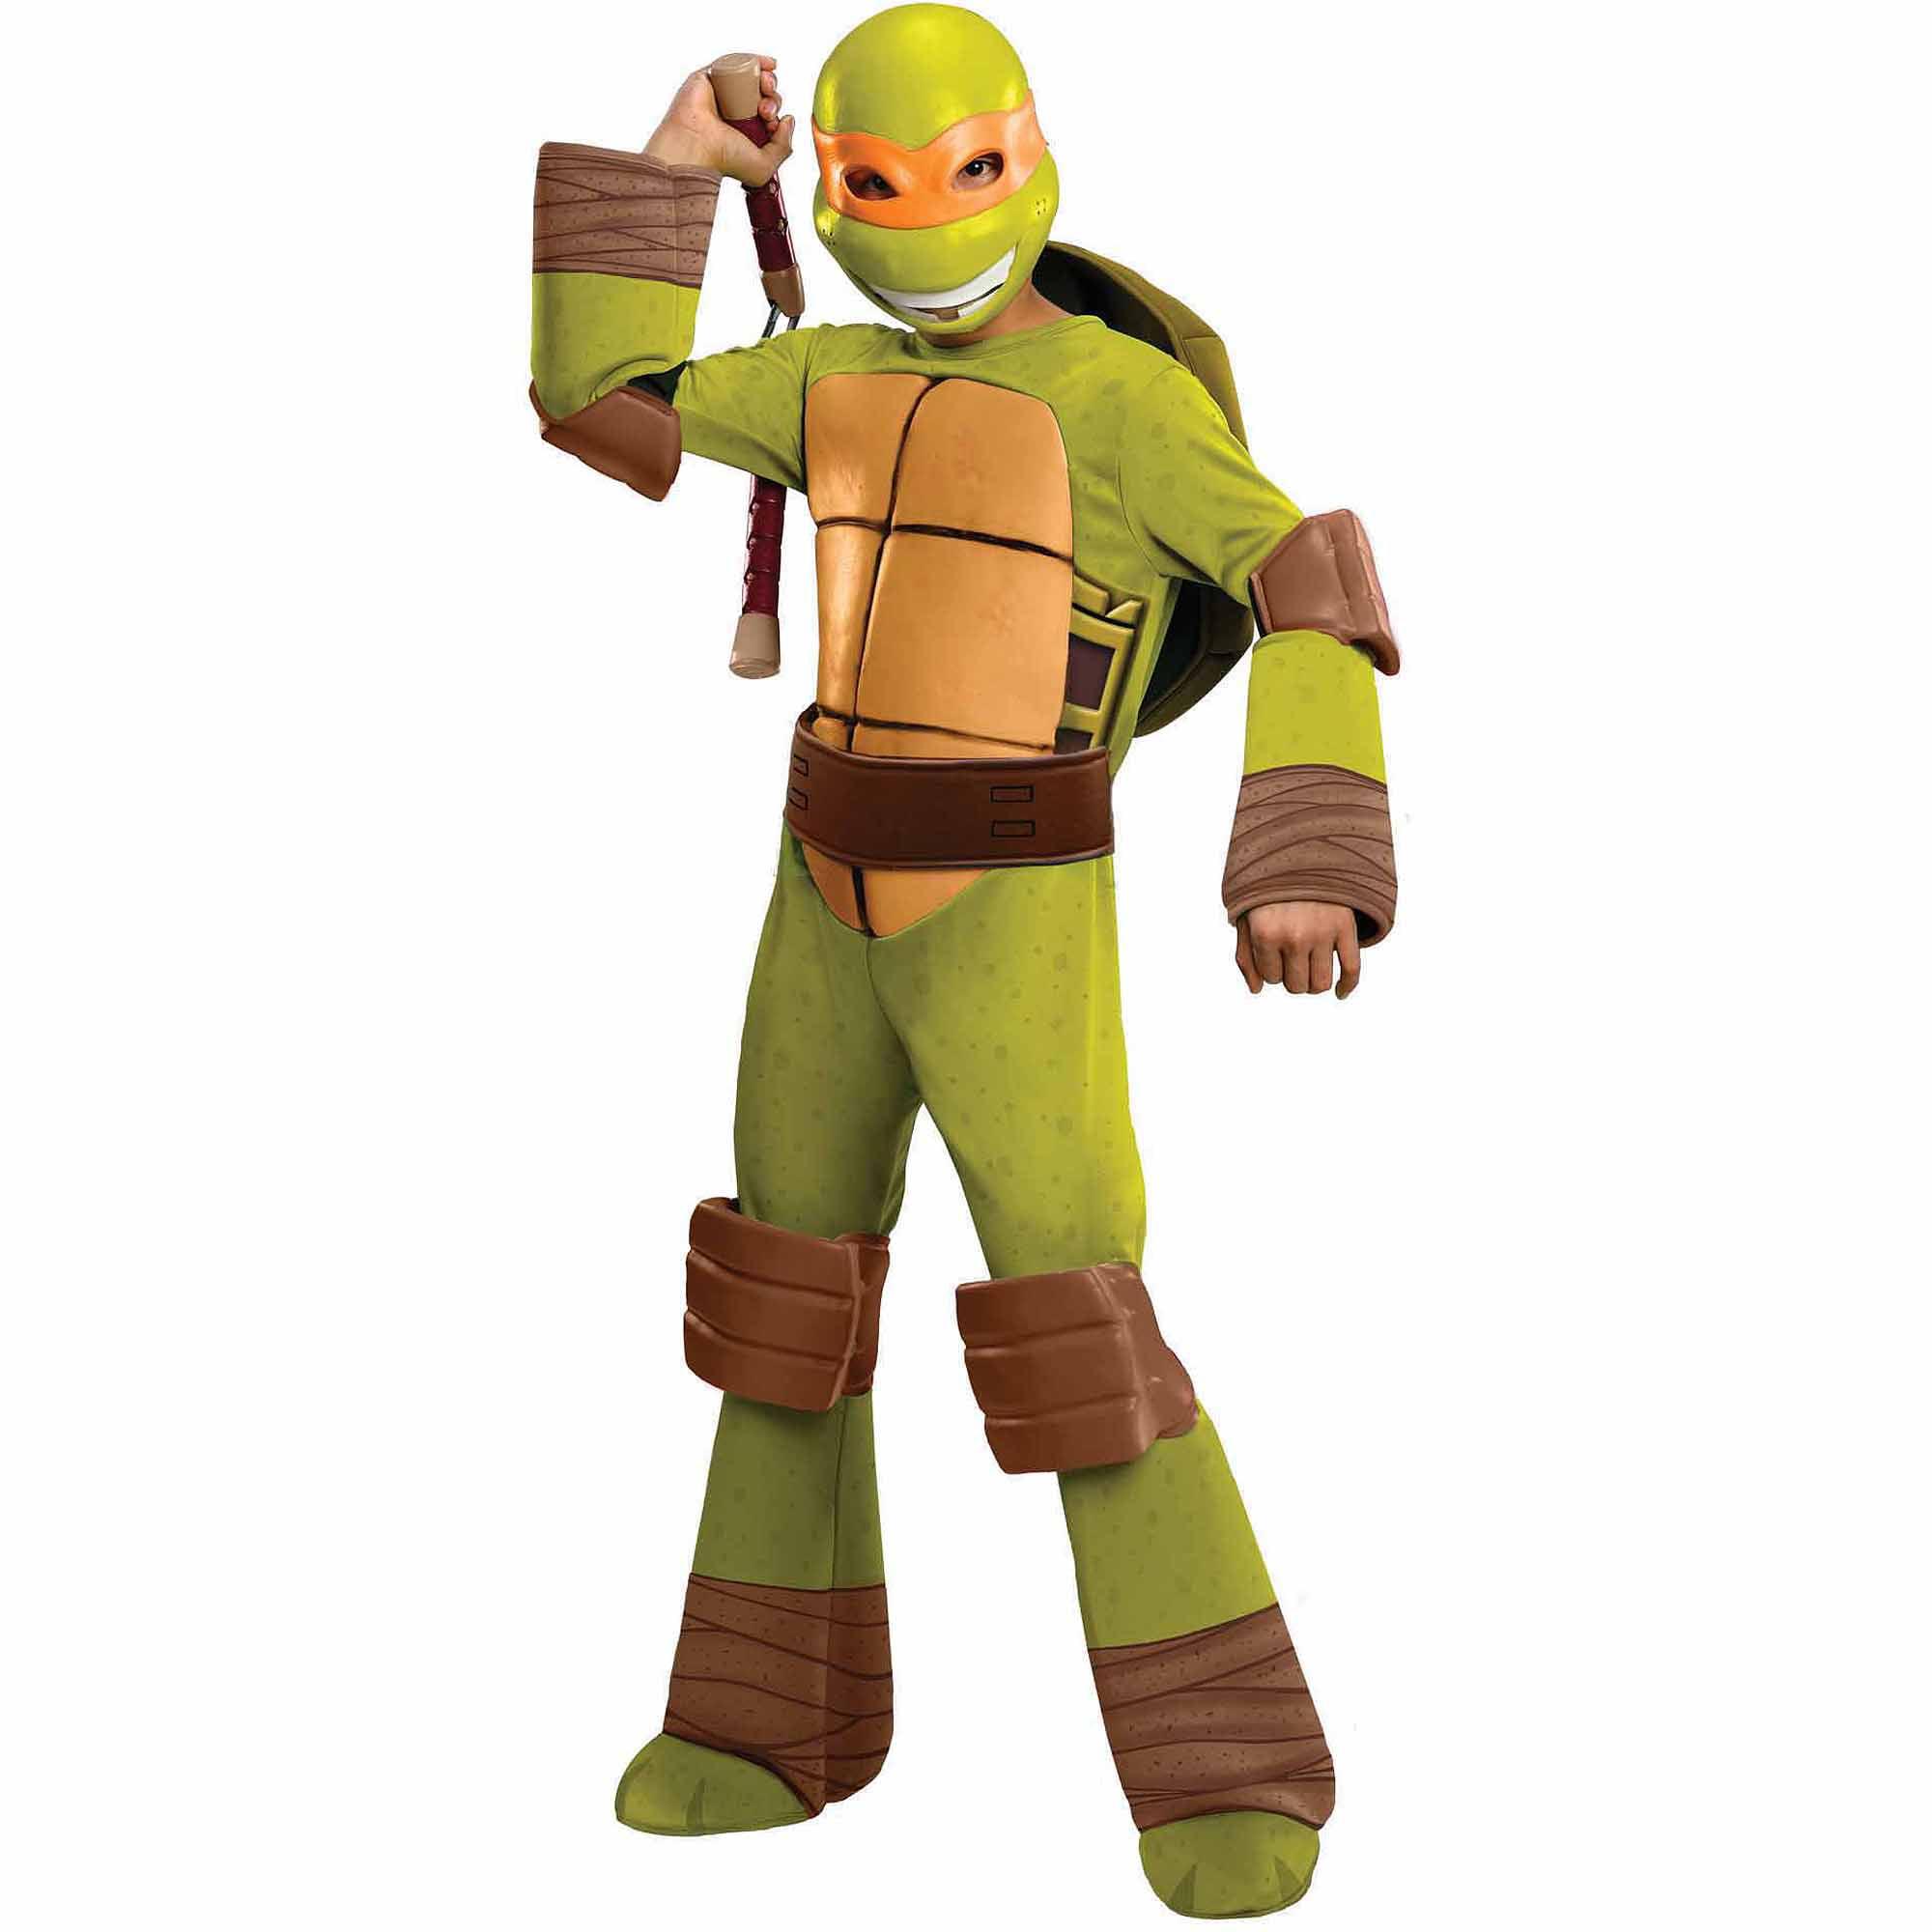 sc 1 st  Walmart & Stealth Ninja Child Halloween Costume - Walmart.com